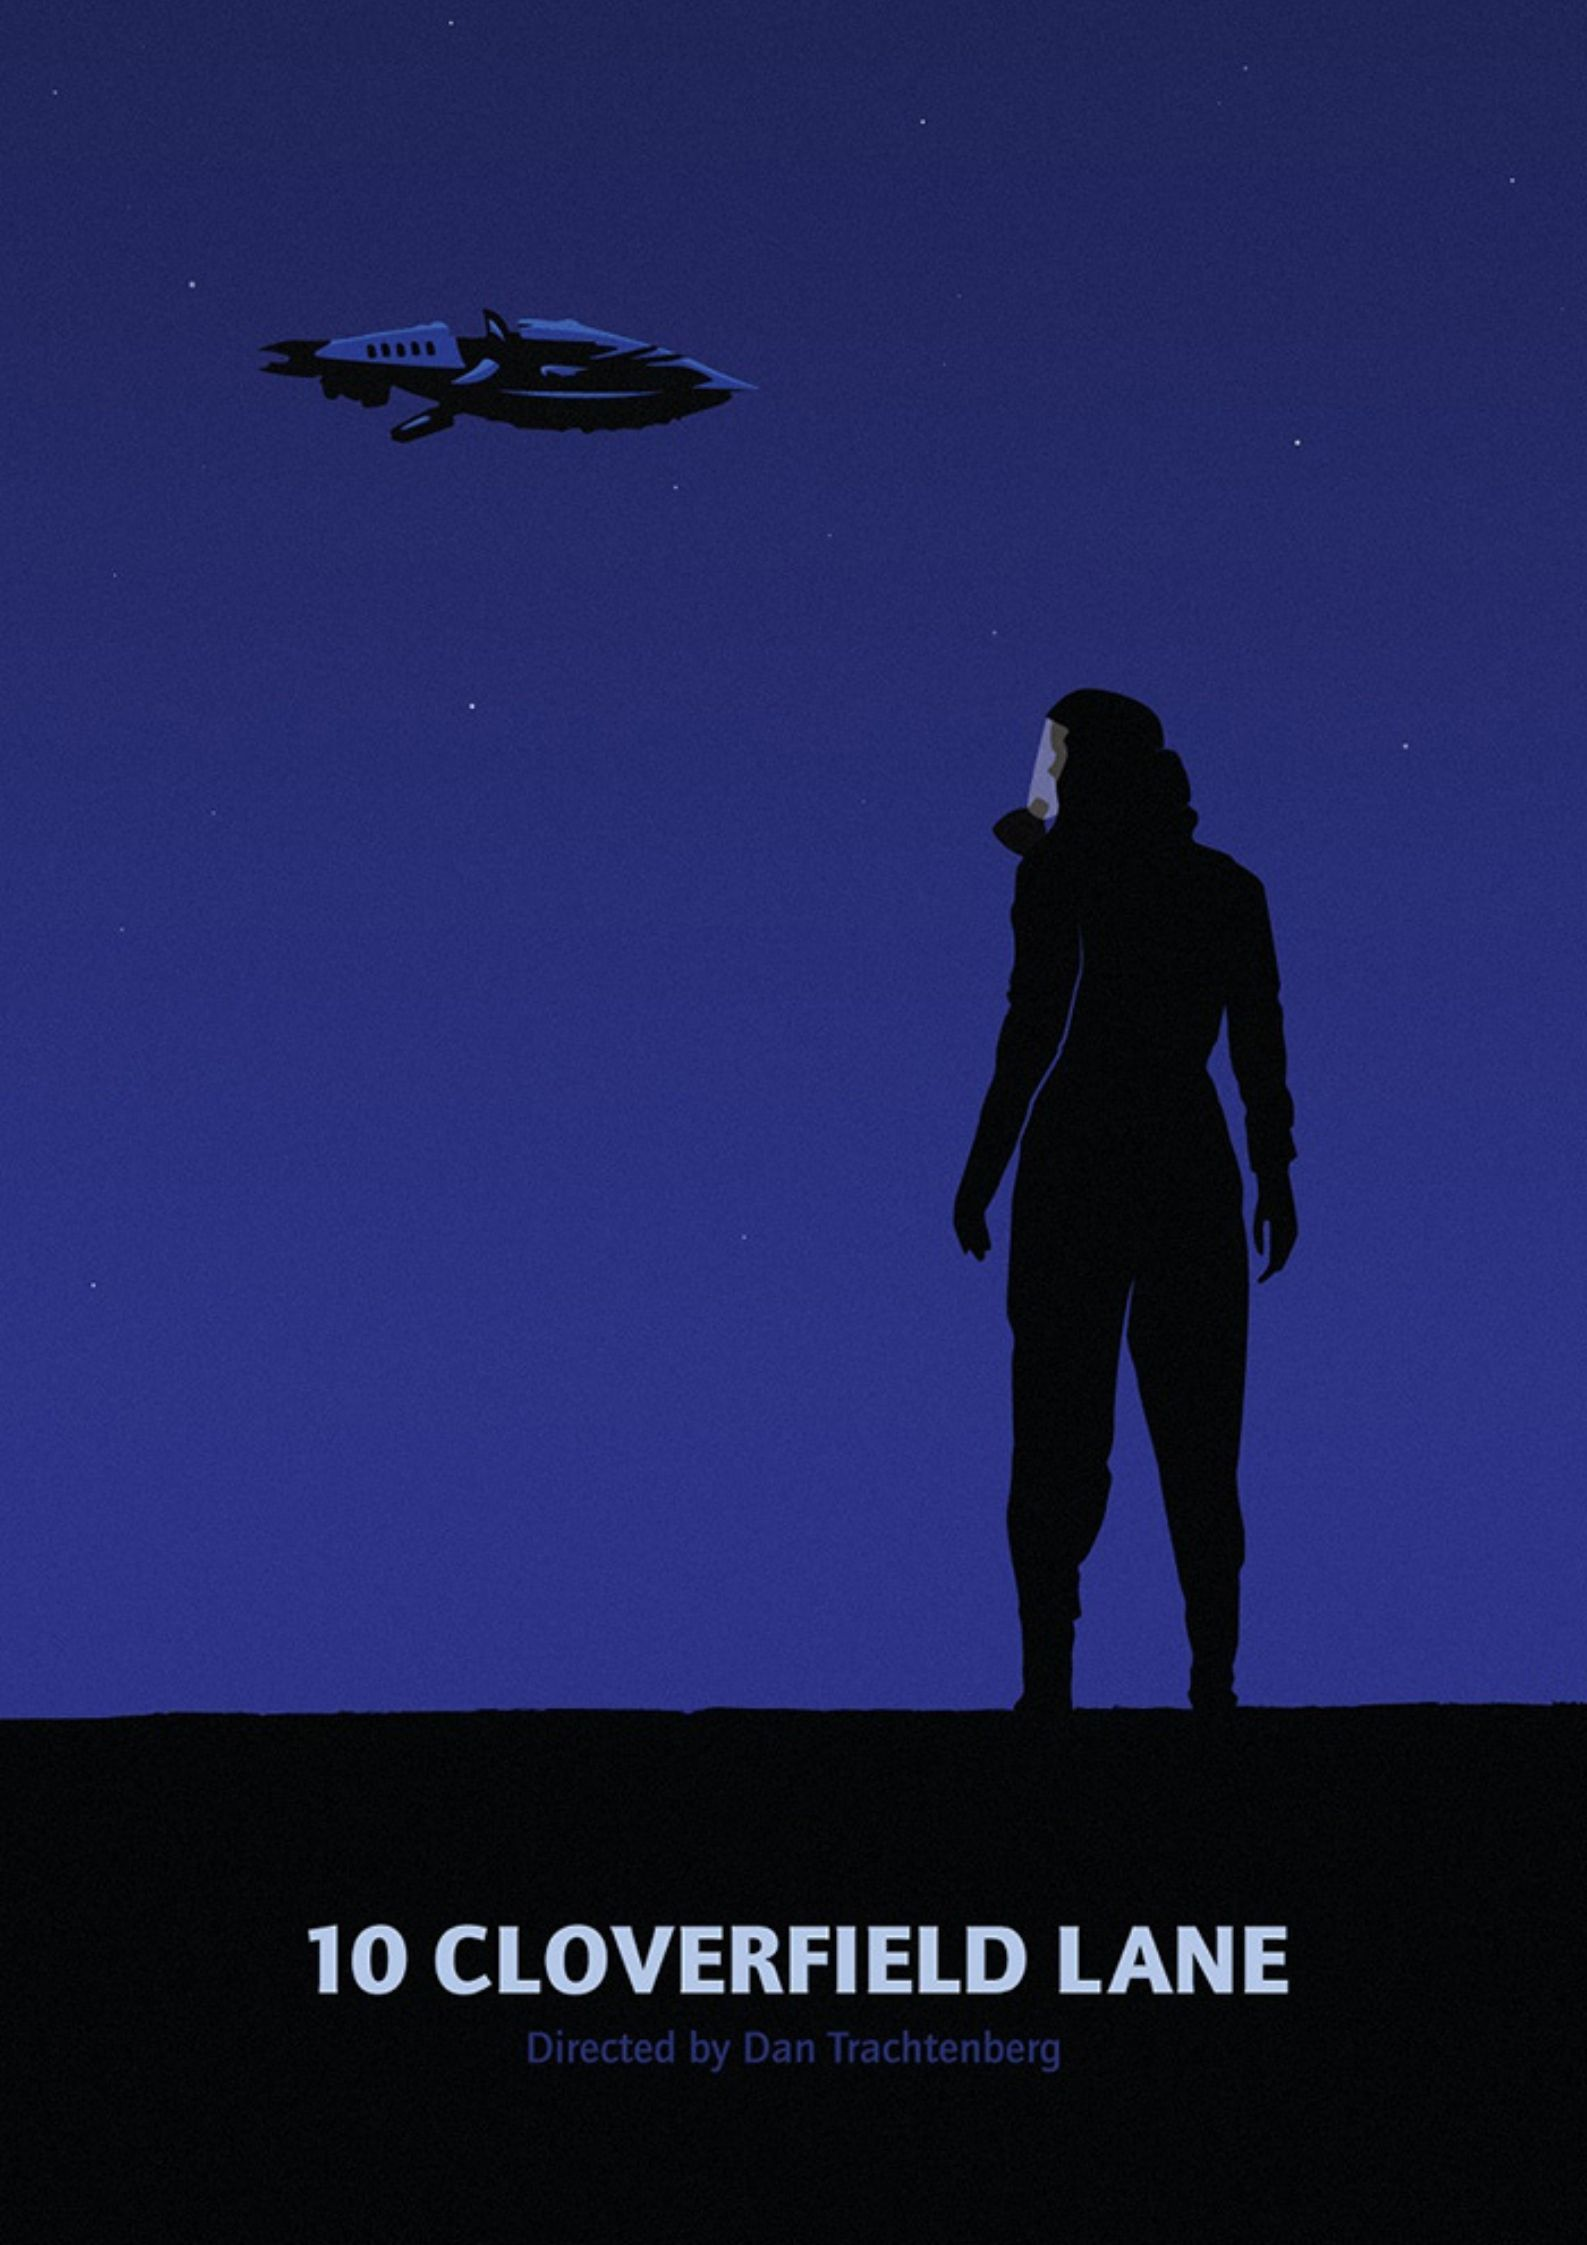 art poster of 10 Cloverfield lane - cosmic horror movie